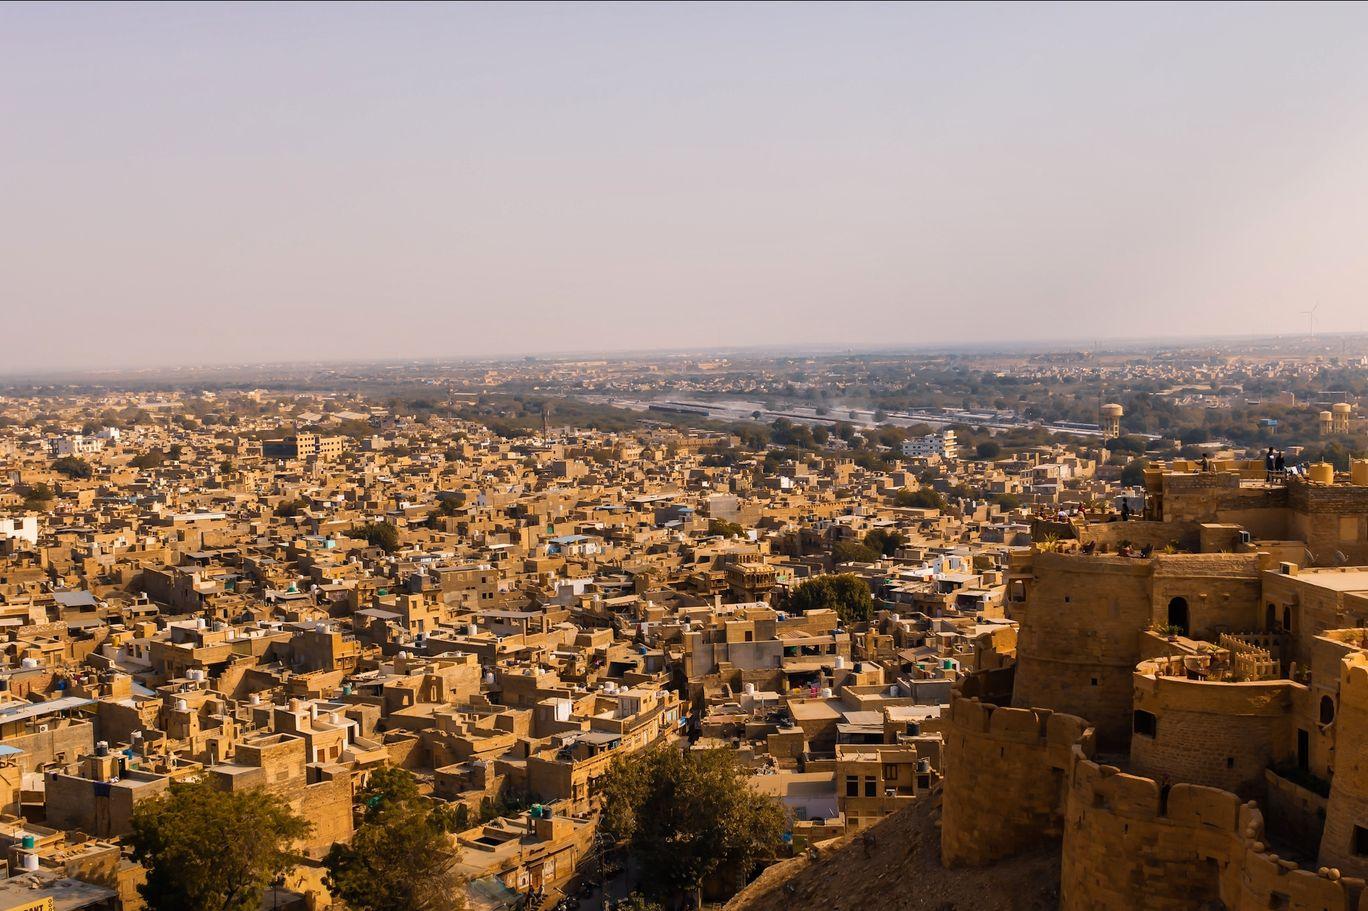 Photo of Jaisalmer Fort By GVPIXEL